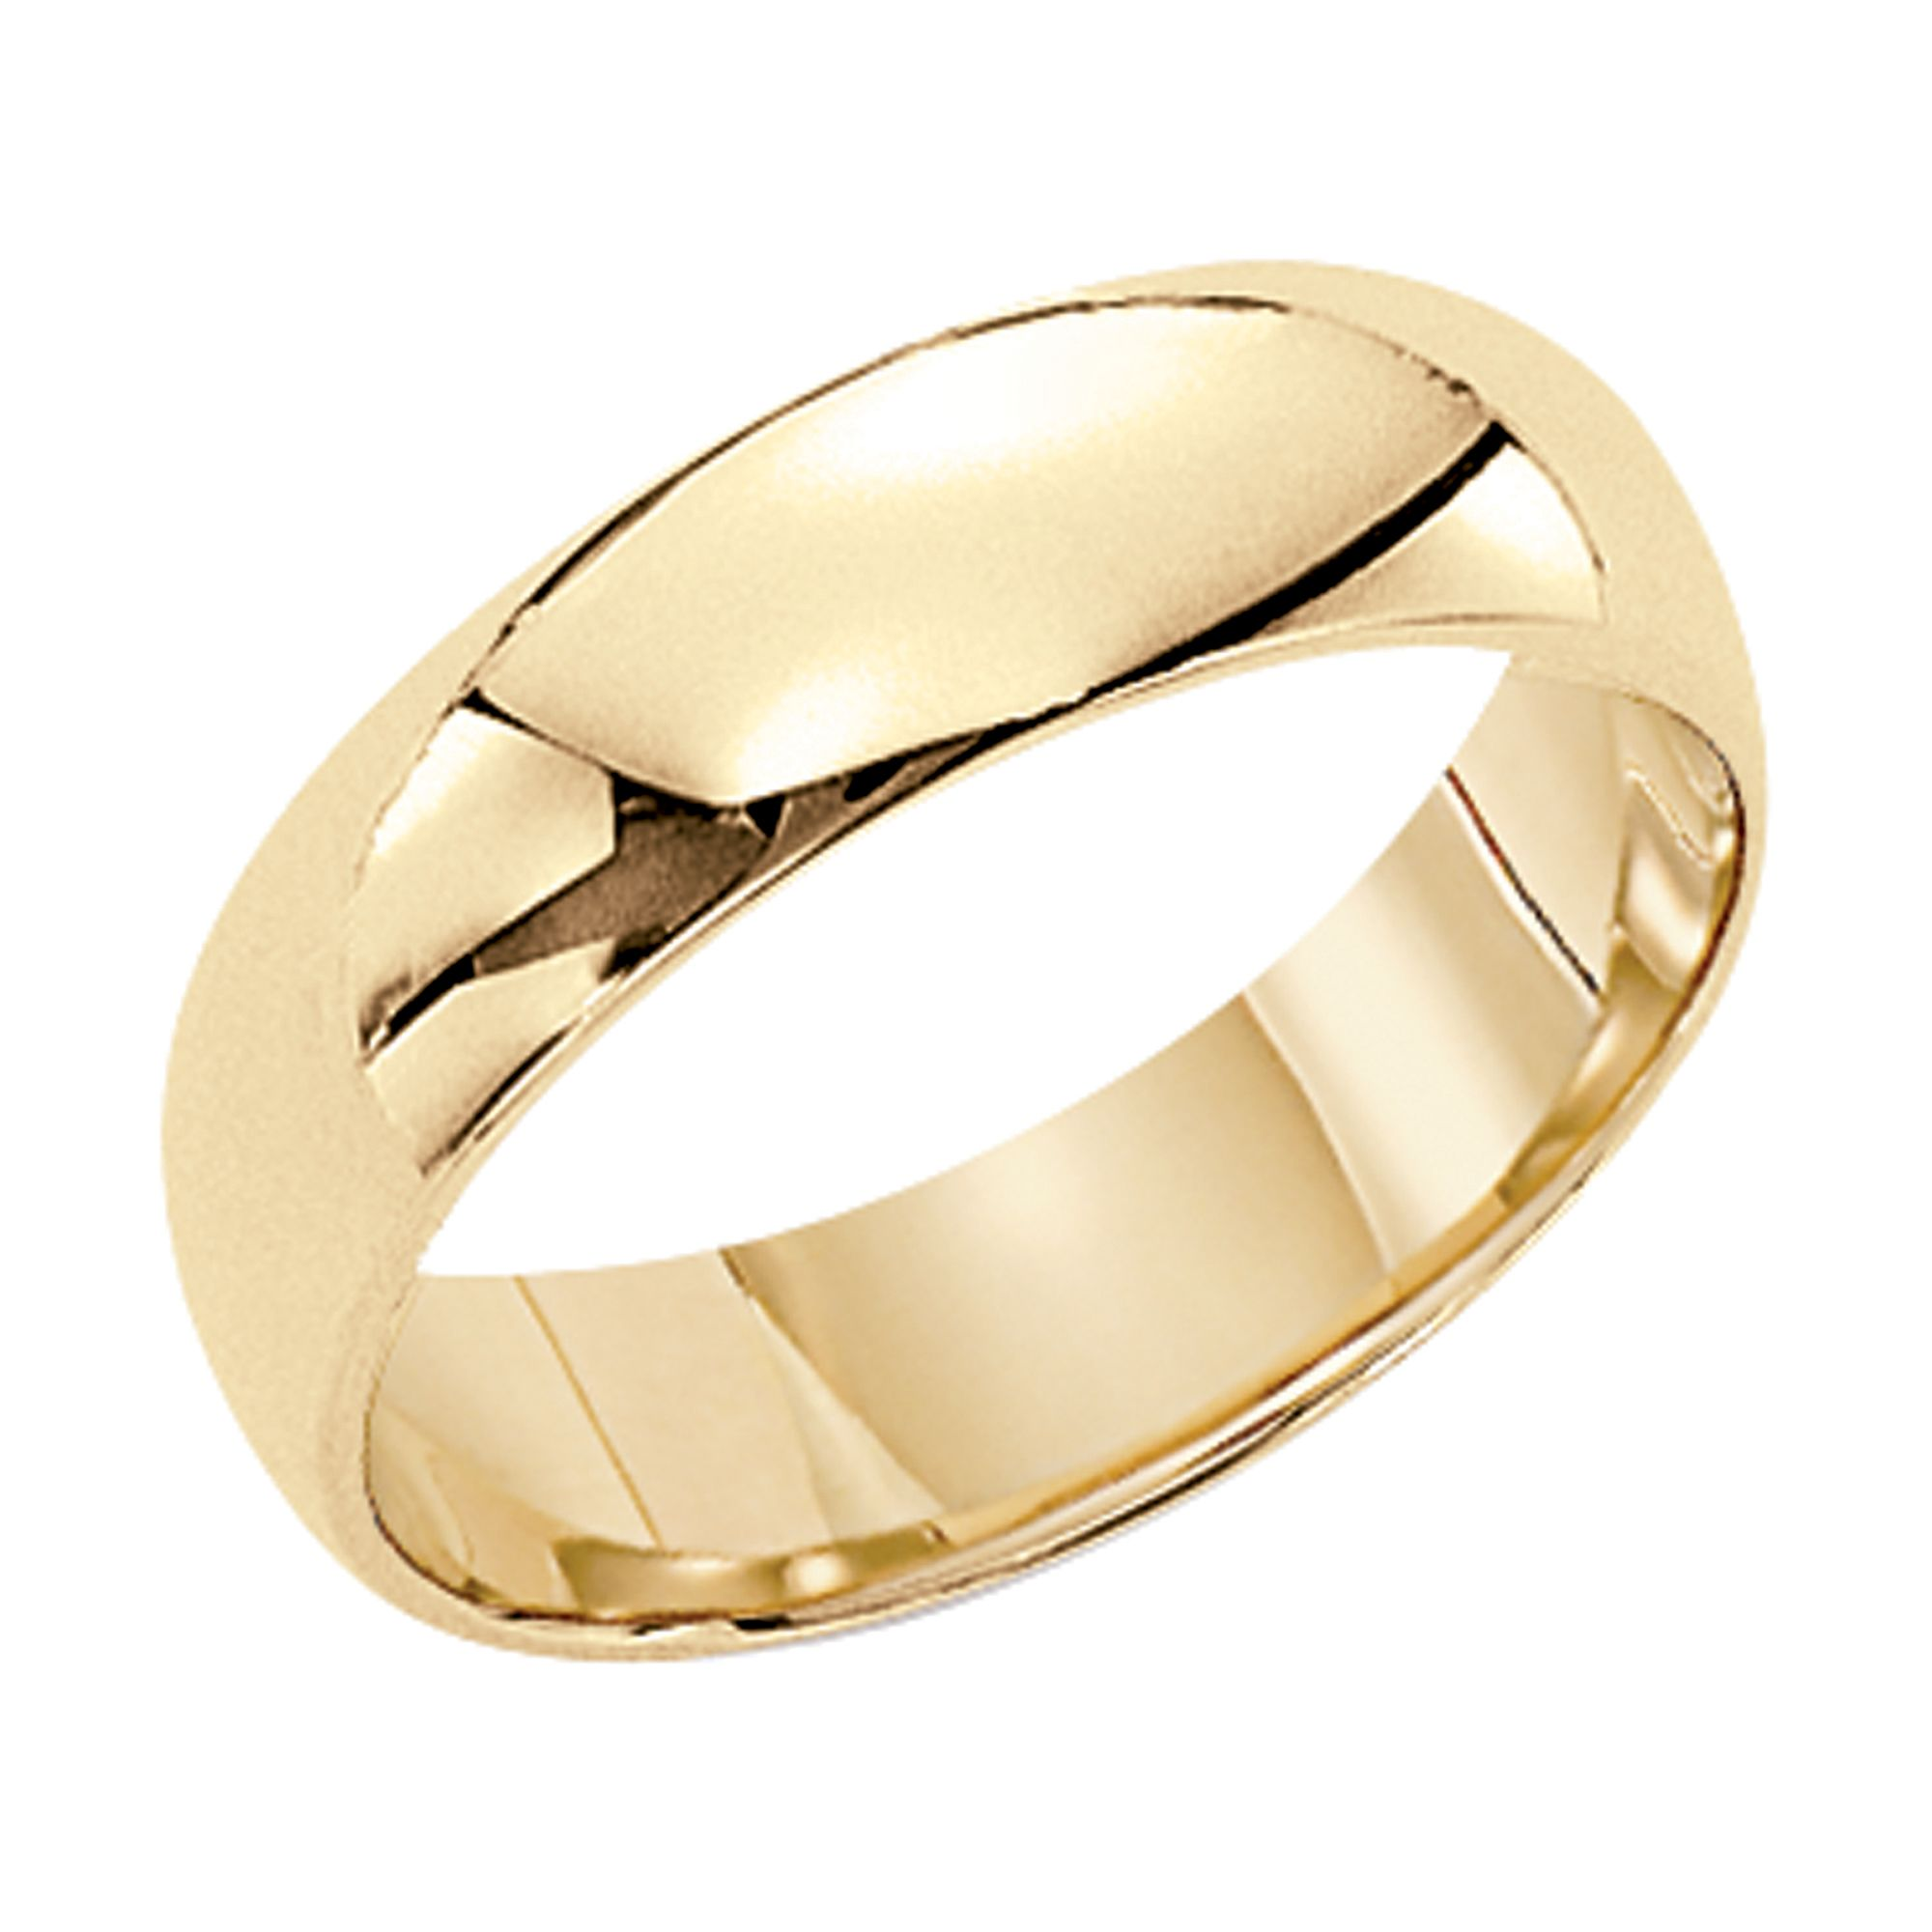 p P gold wedding bands